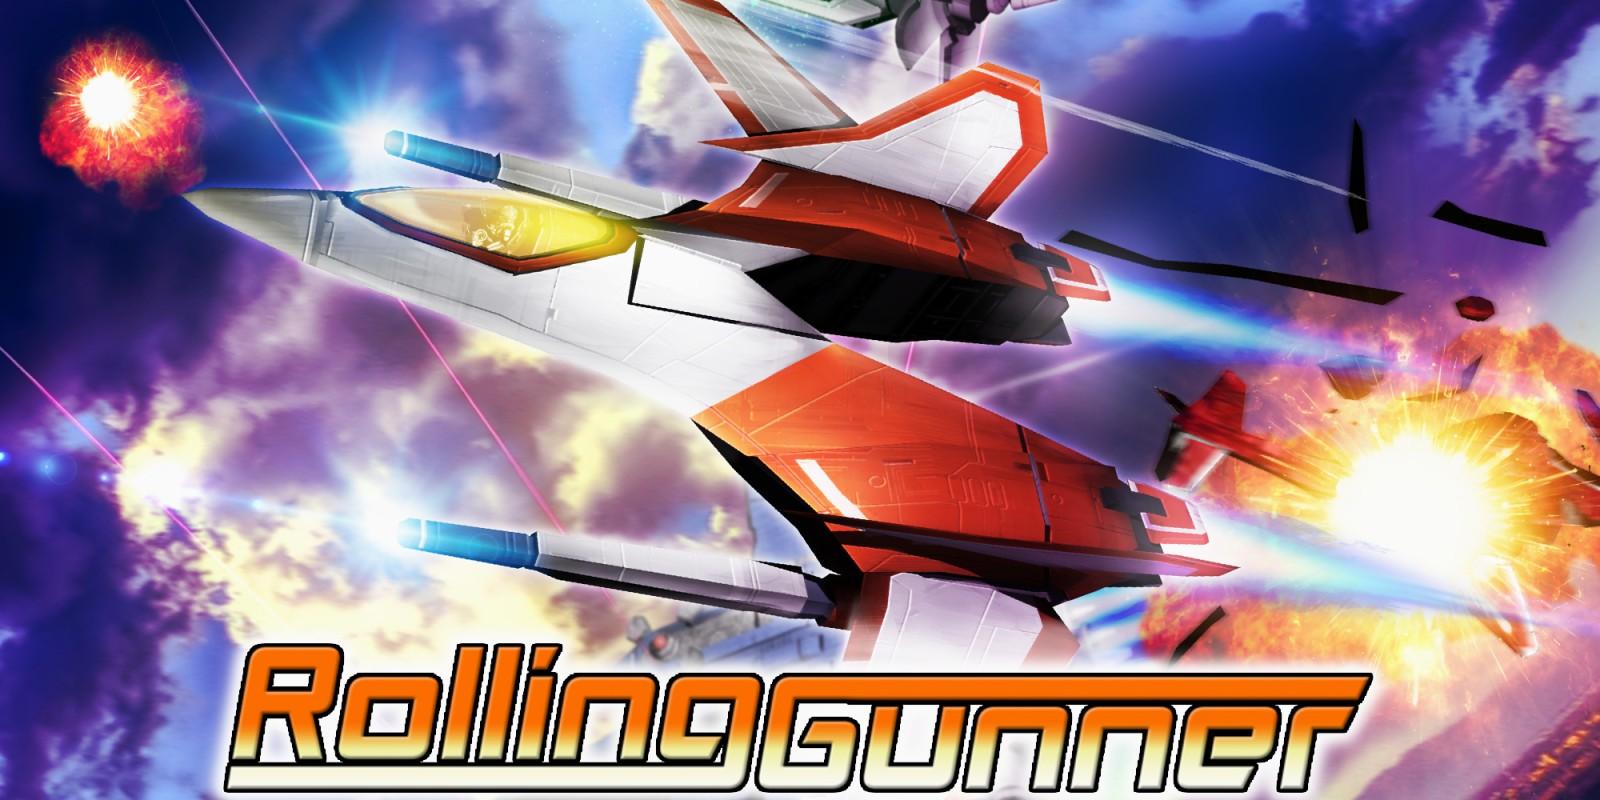 H2x1_NSwitchDS_RollingGunner_image1600w.jpg